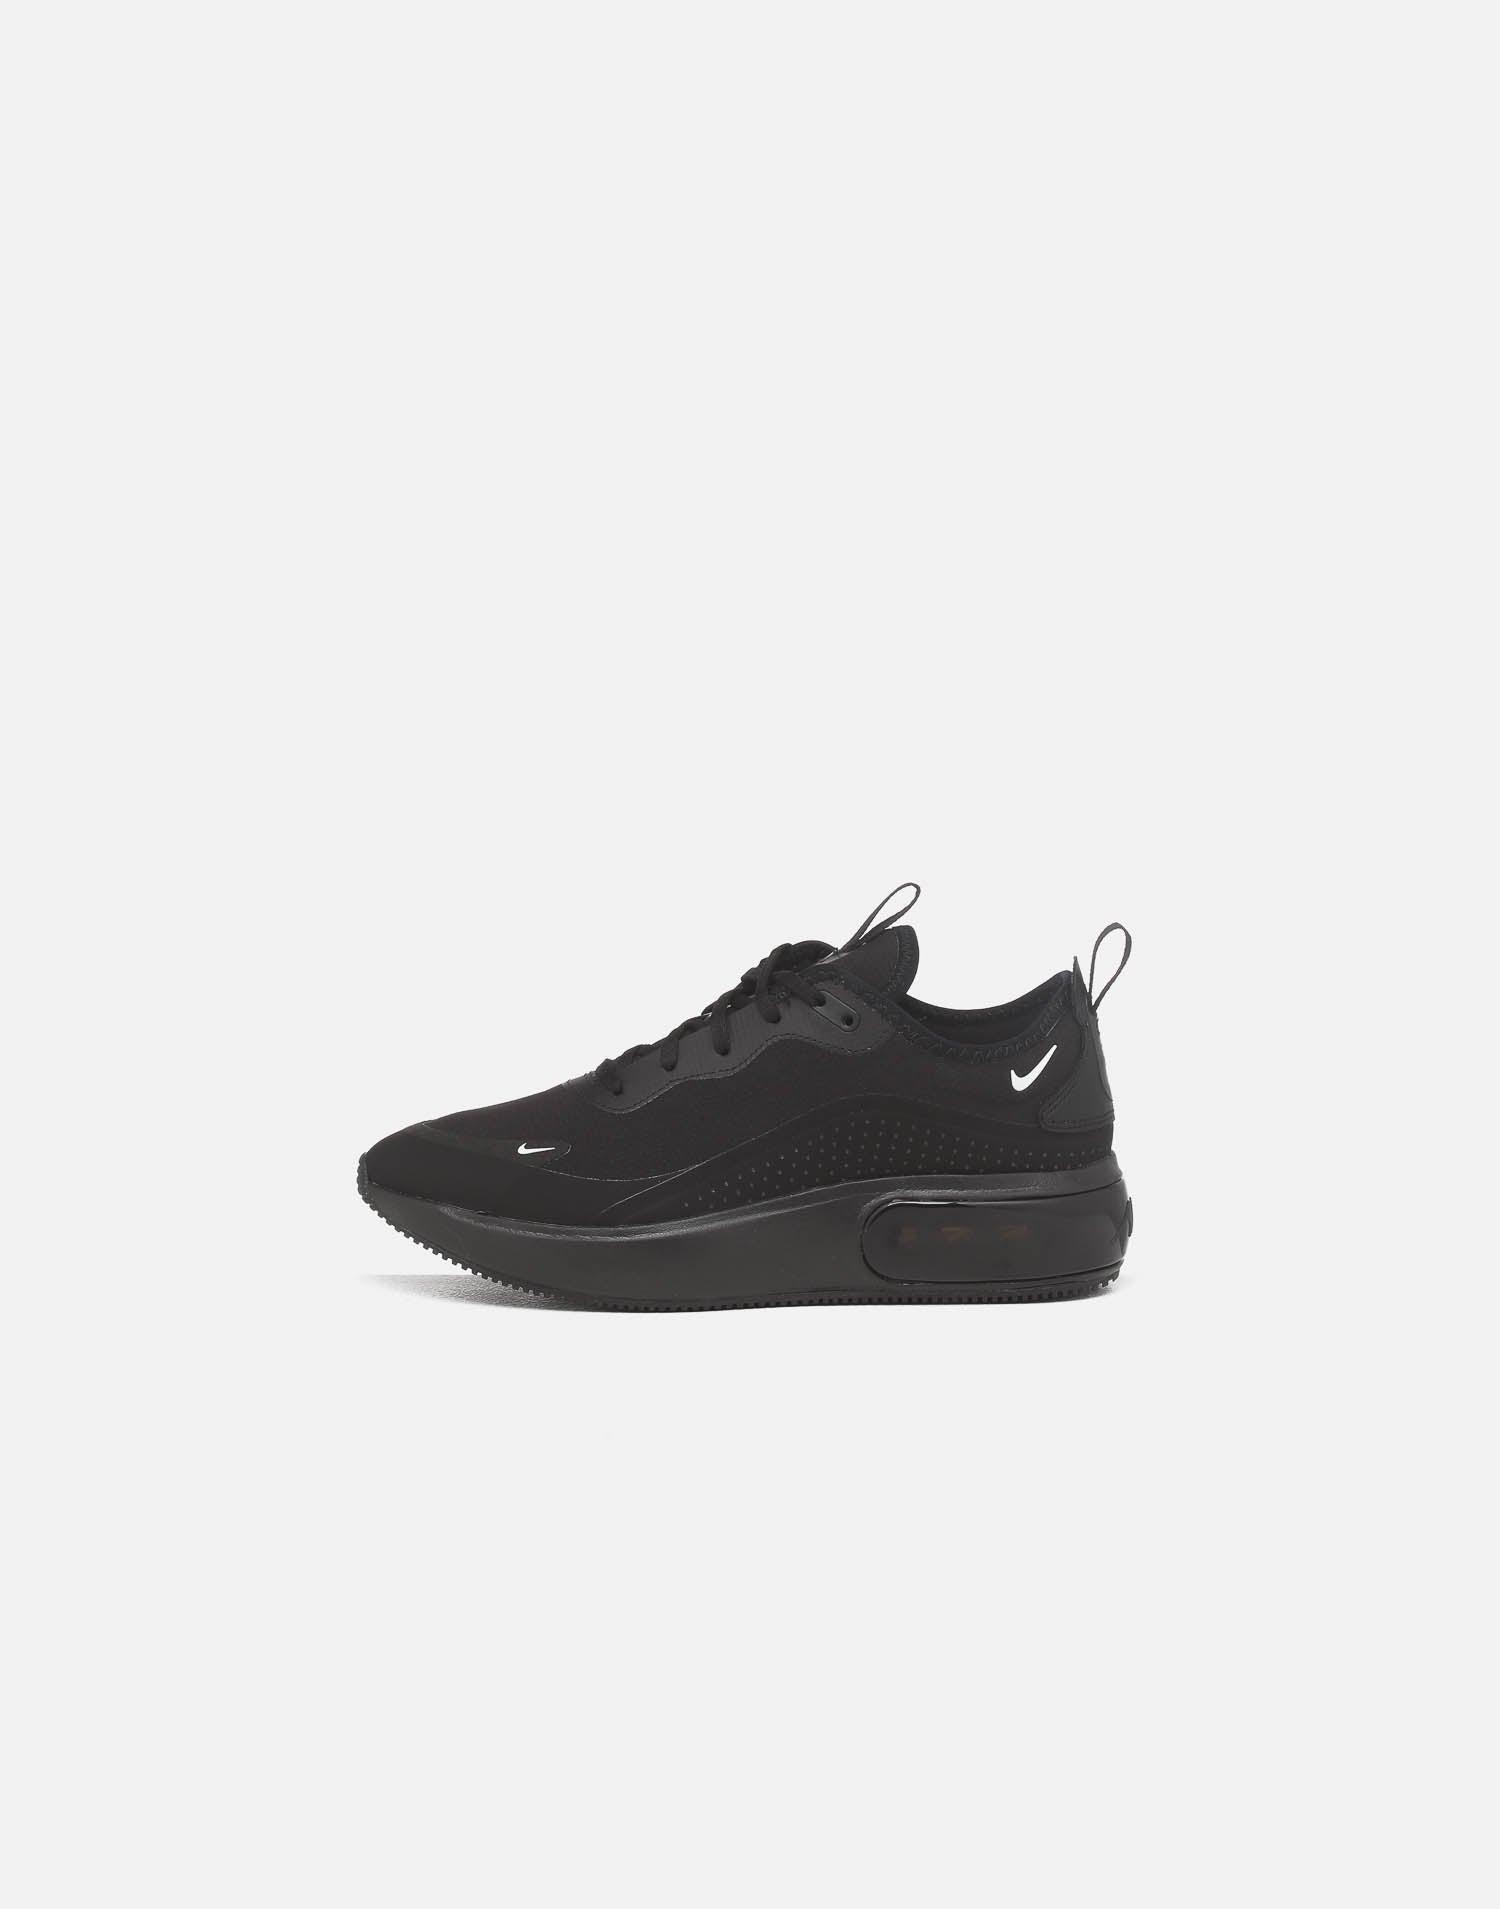 Nike Women's Air Max DIA BlackMetallic